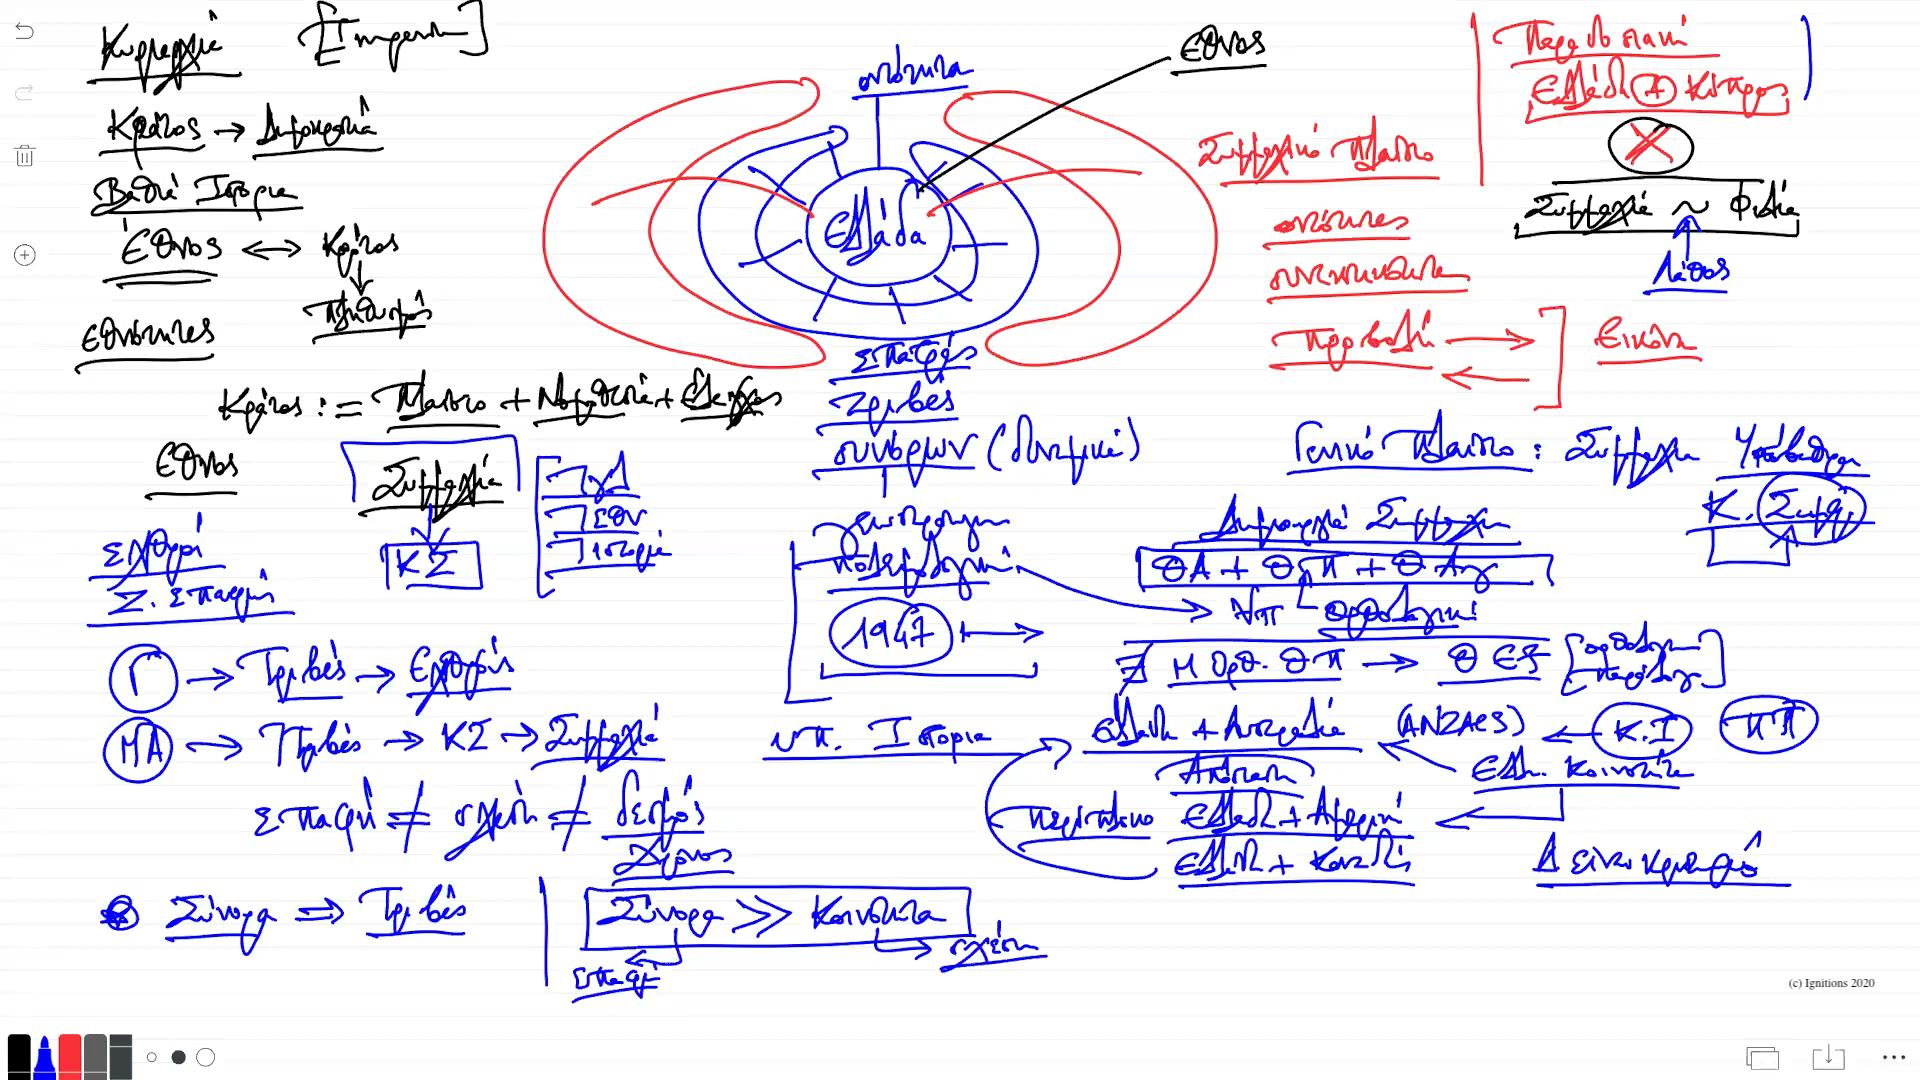 56019 - IX - e-Διάλεξη: Ελληνική Γεωστρατηγική I. (Dessin)